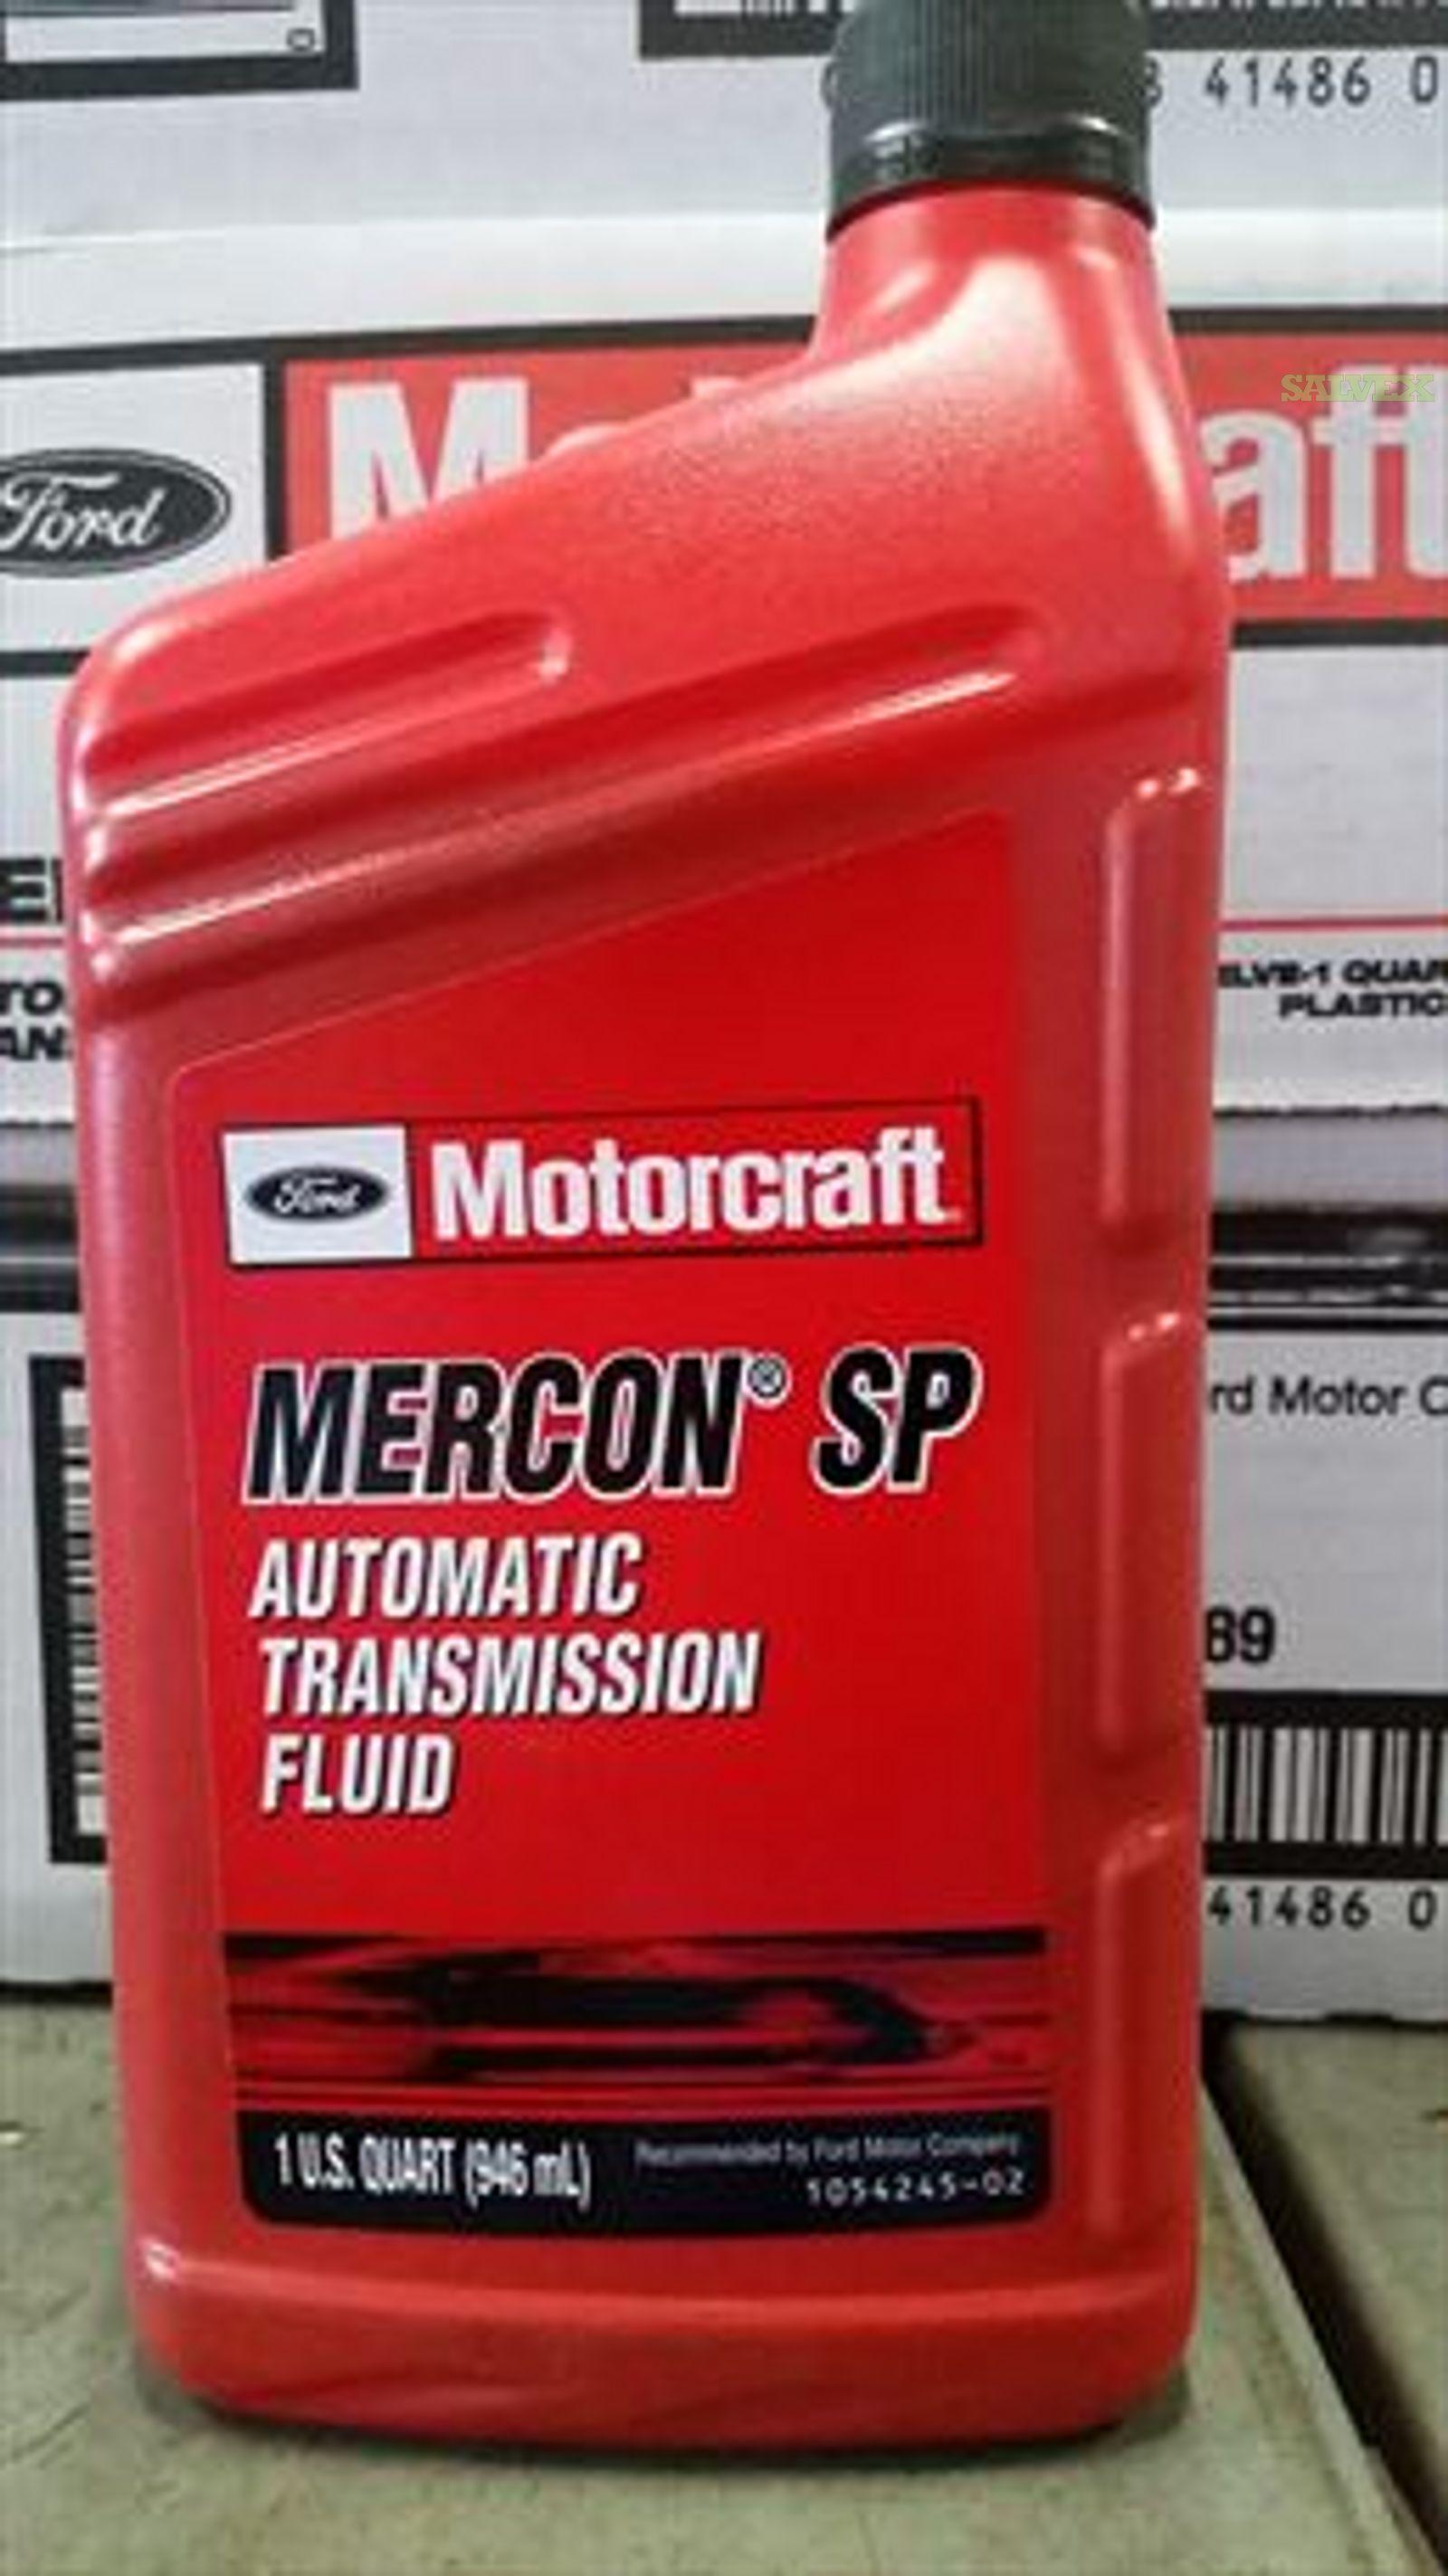 Motorcraft Mercon SP ATF (6 Cases)